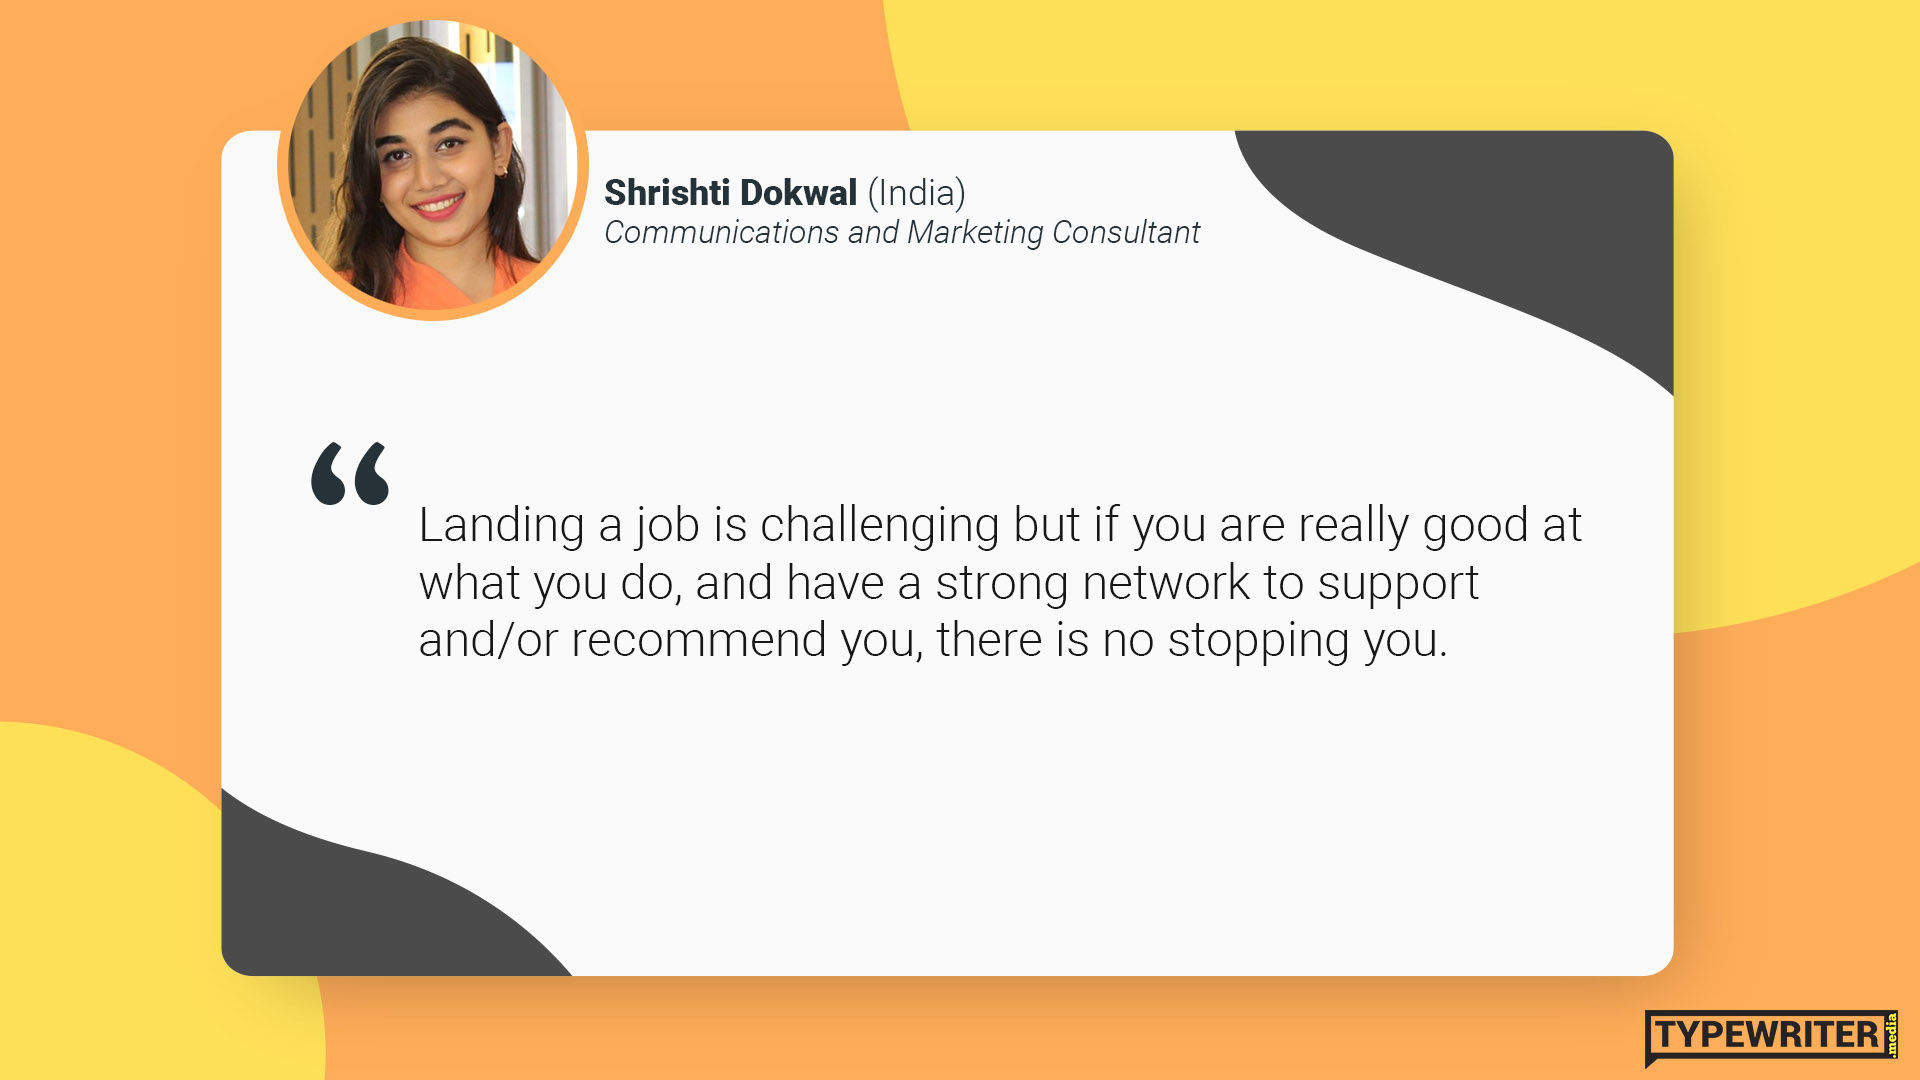 Shrishti advice to international communications graduates